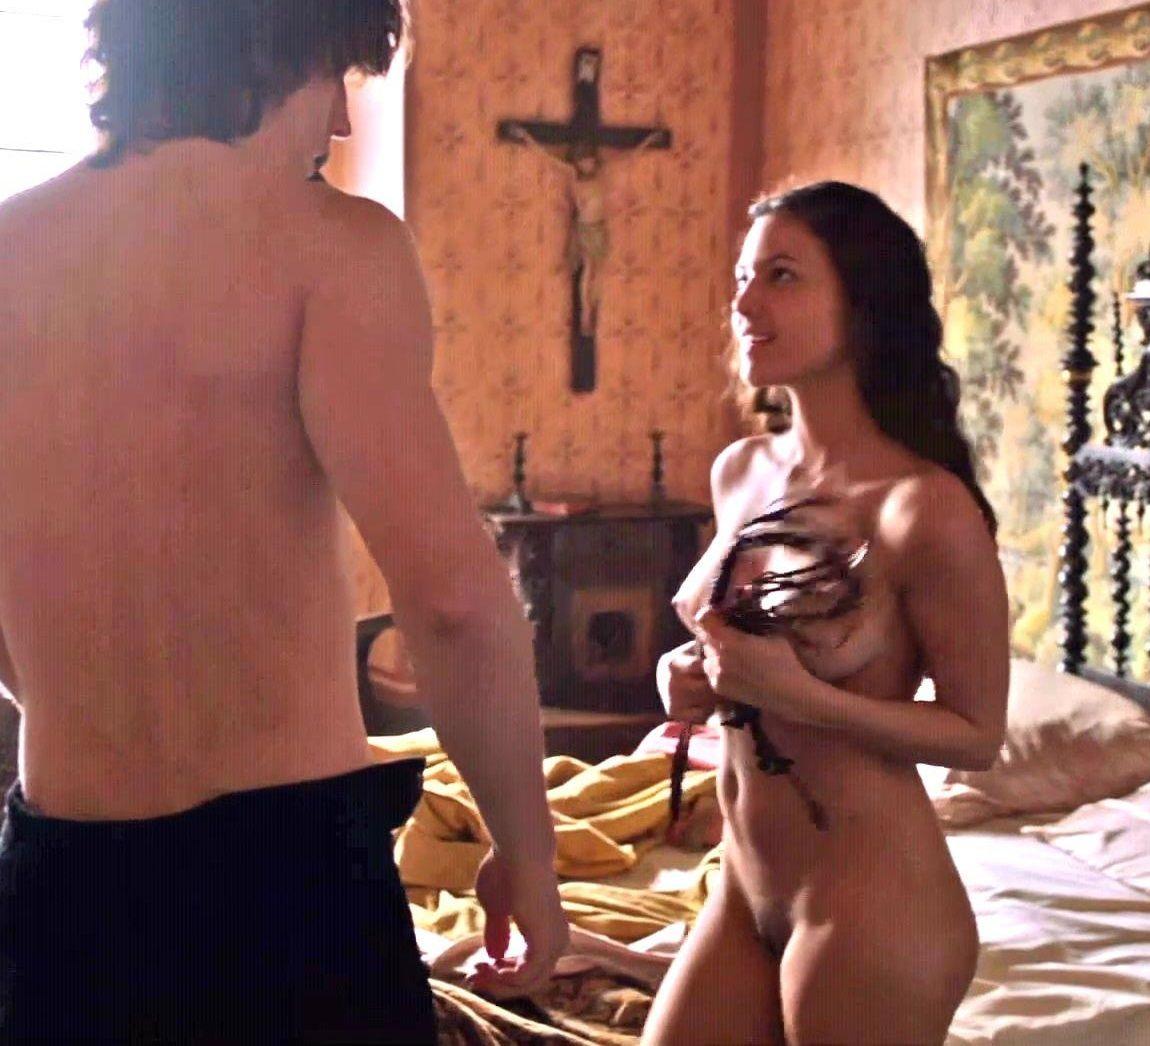 Andrea Duro Descuido elisa mouliaá desnuda en la serie borgia |